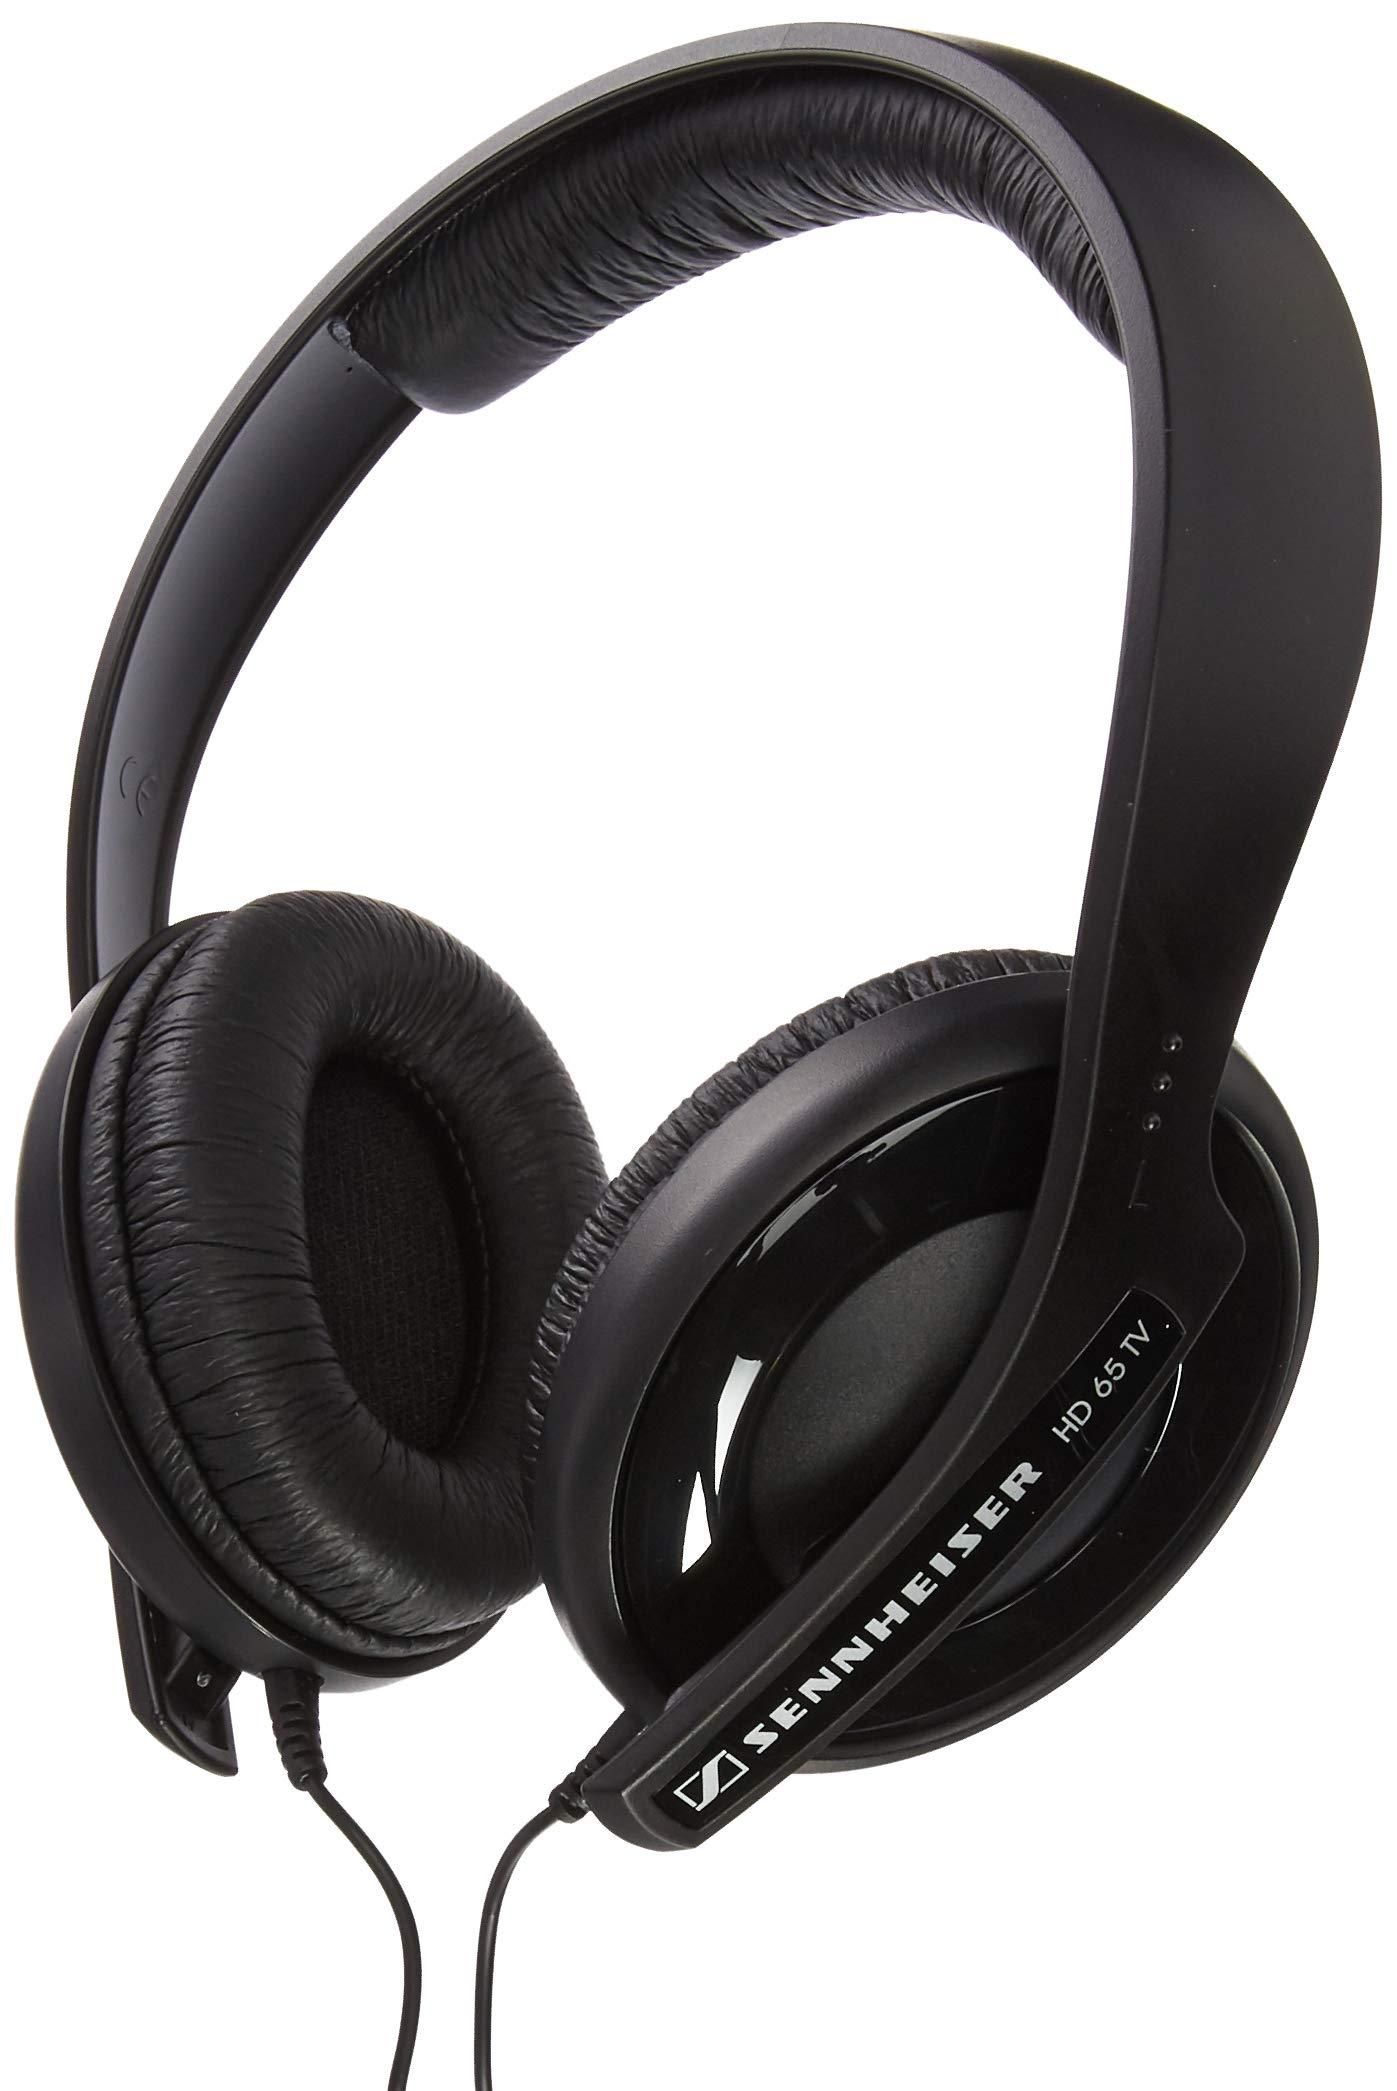 Amazon.com: Sennheiser HD 65 TV Closed Back Dynamic Headphones for TVs:  Home Audio & Theater